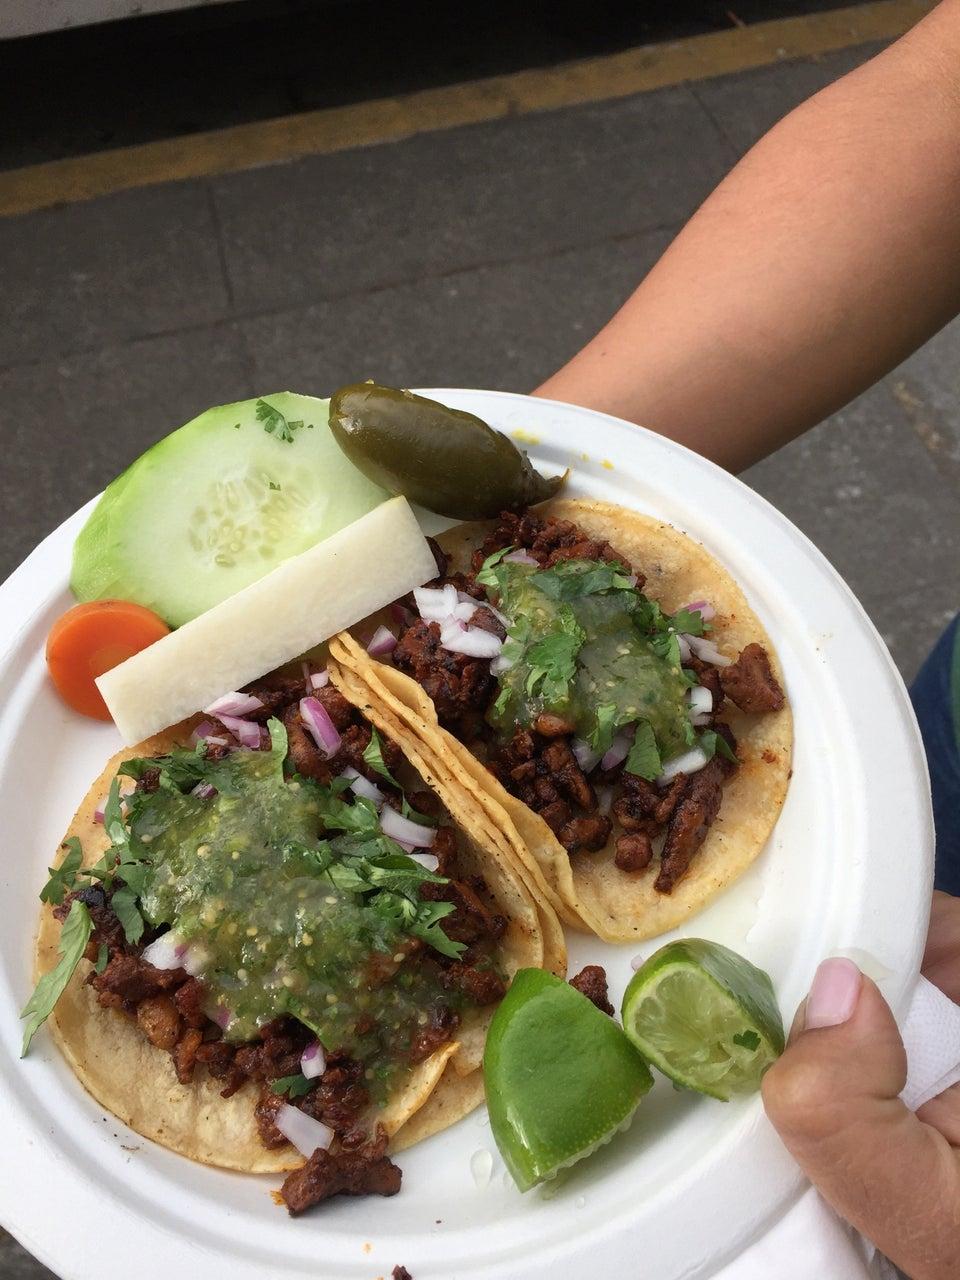 Tacos Panzon 2198 Campbell St #2000, Oakland